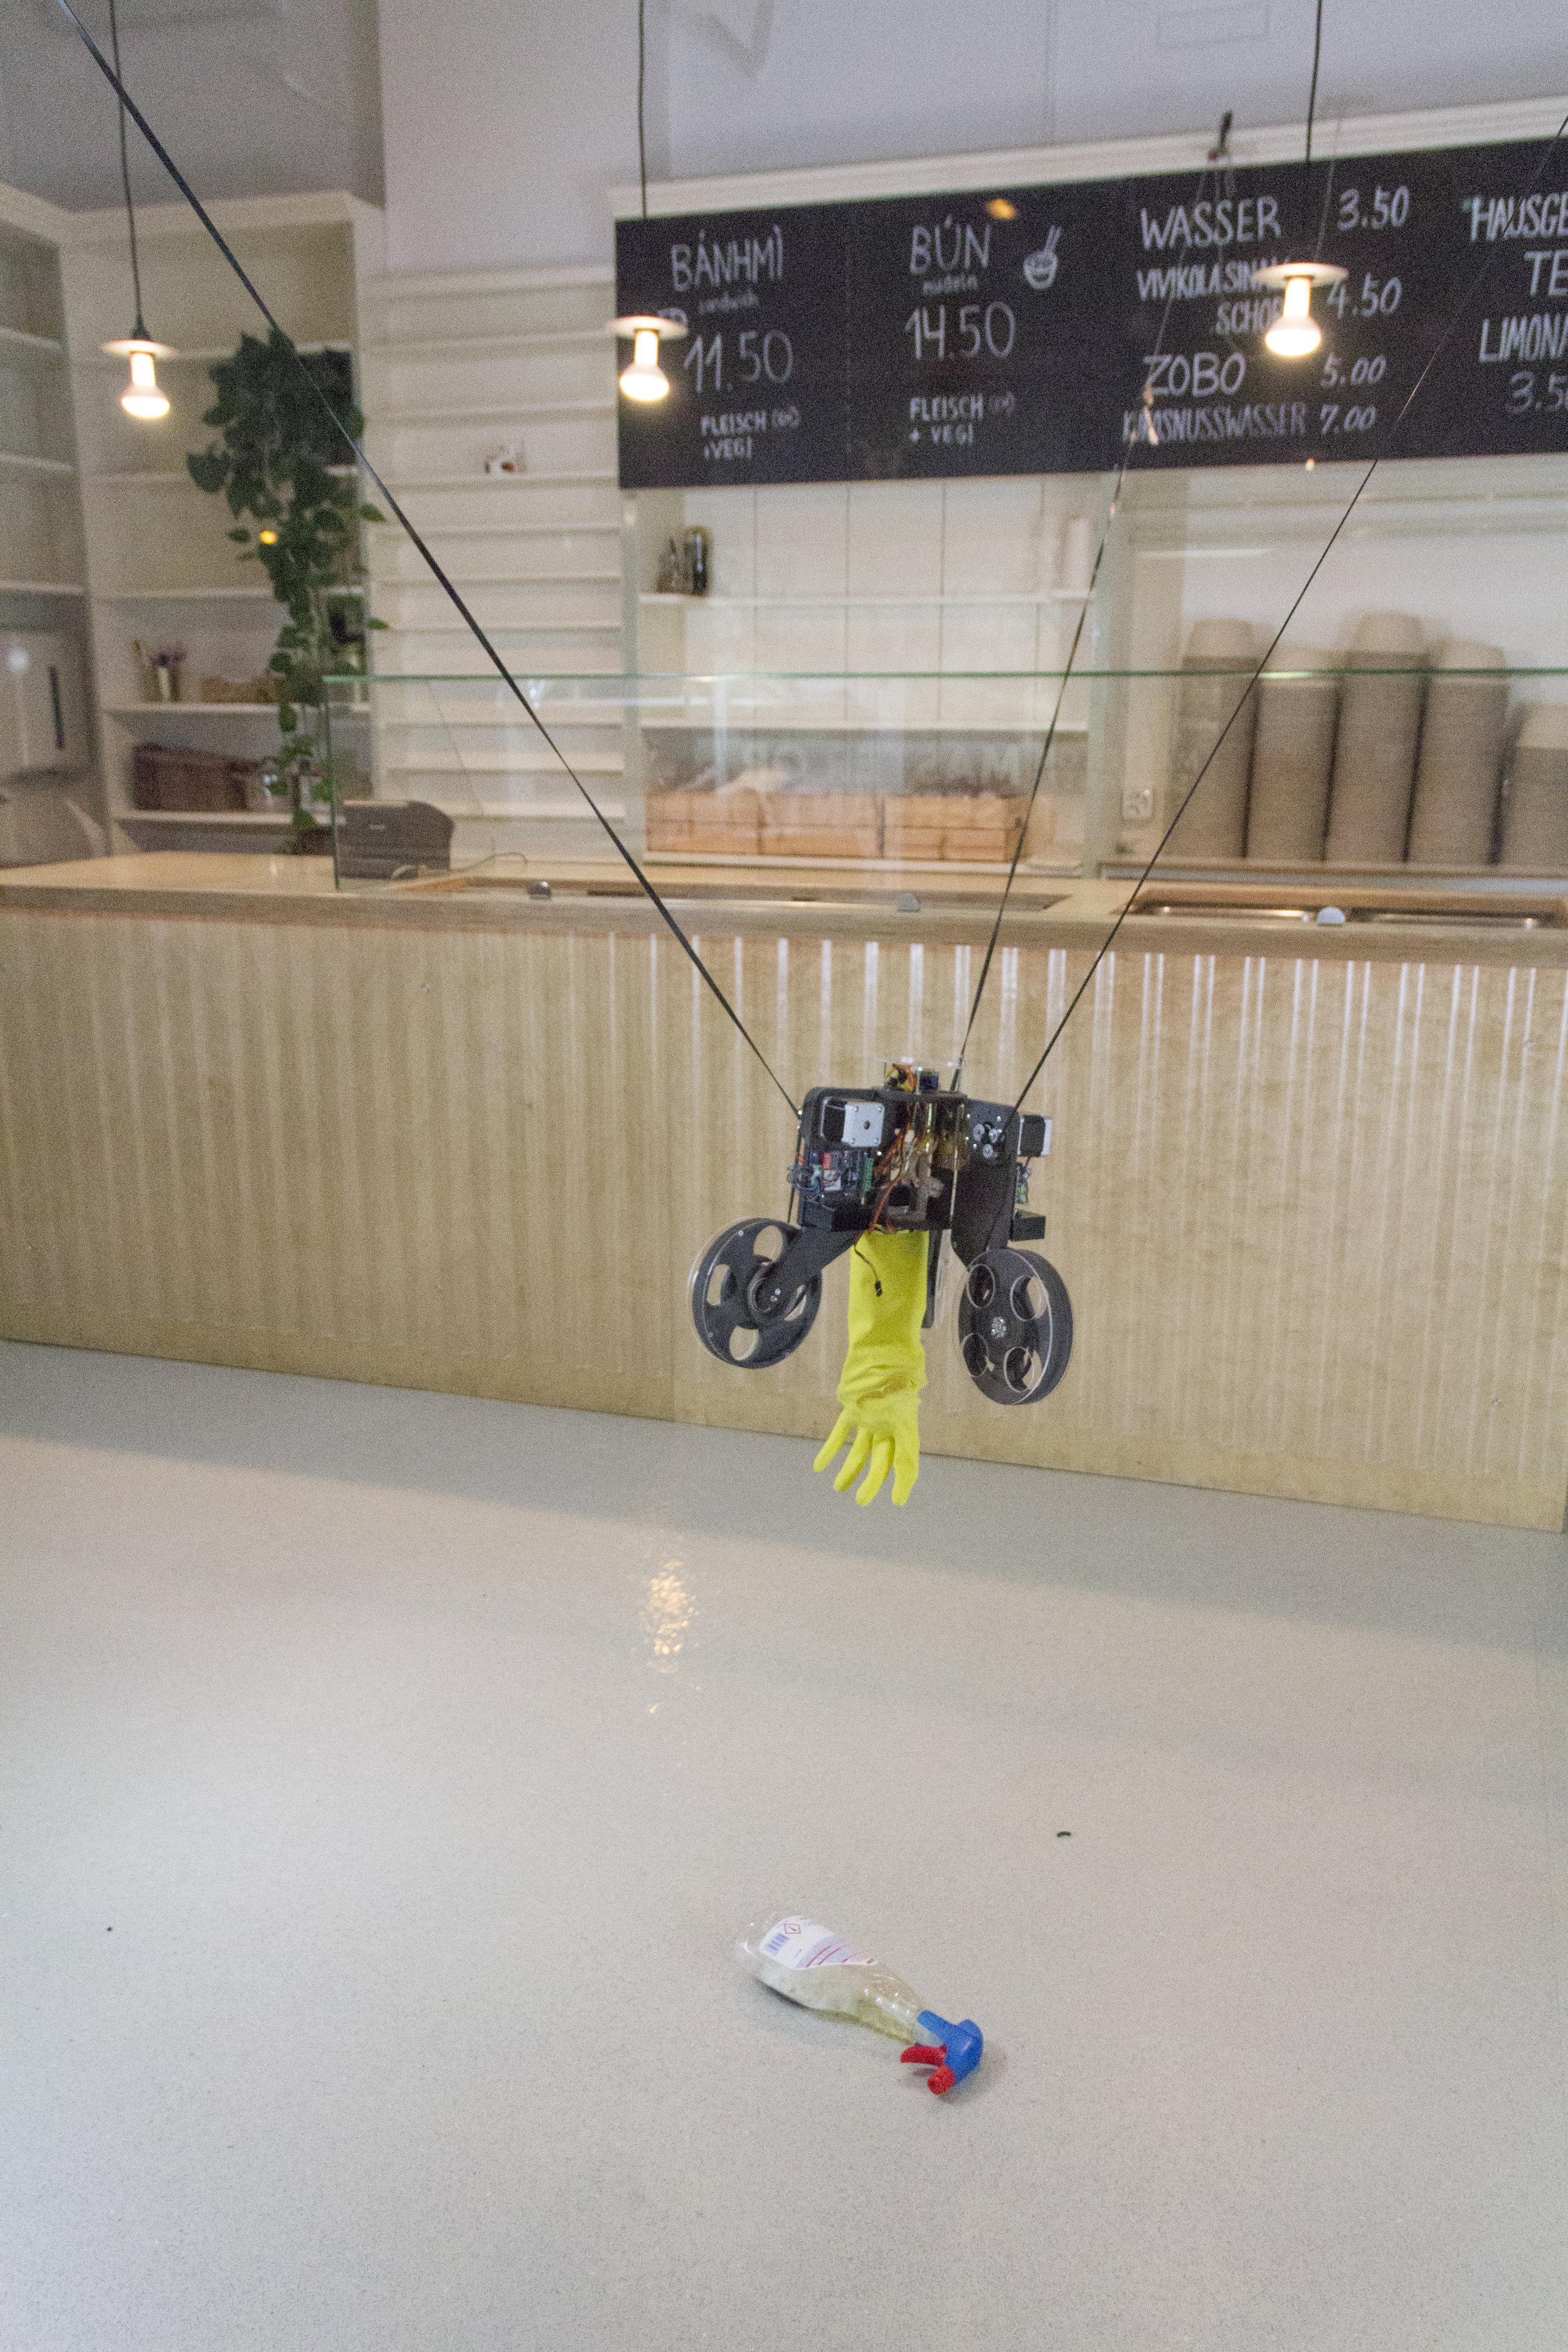 The  Ungenaubot  handling simple tasks in a take away restaurant, 2018. Photograph by Ilmar Hurkxkens and Fabian Bircher